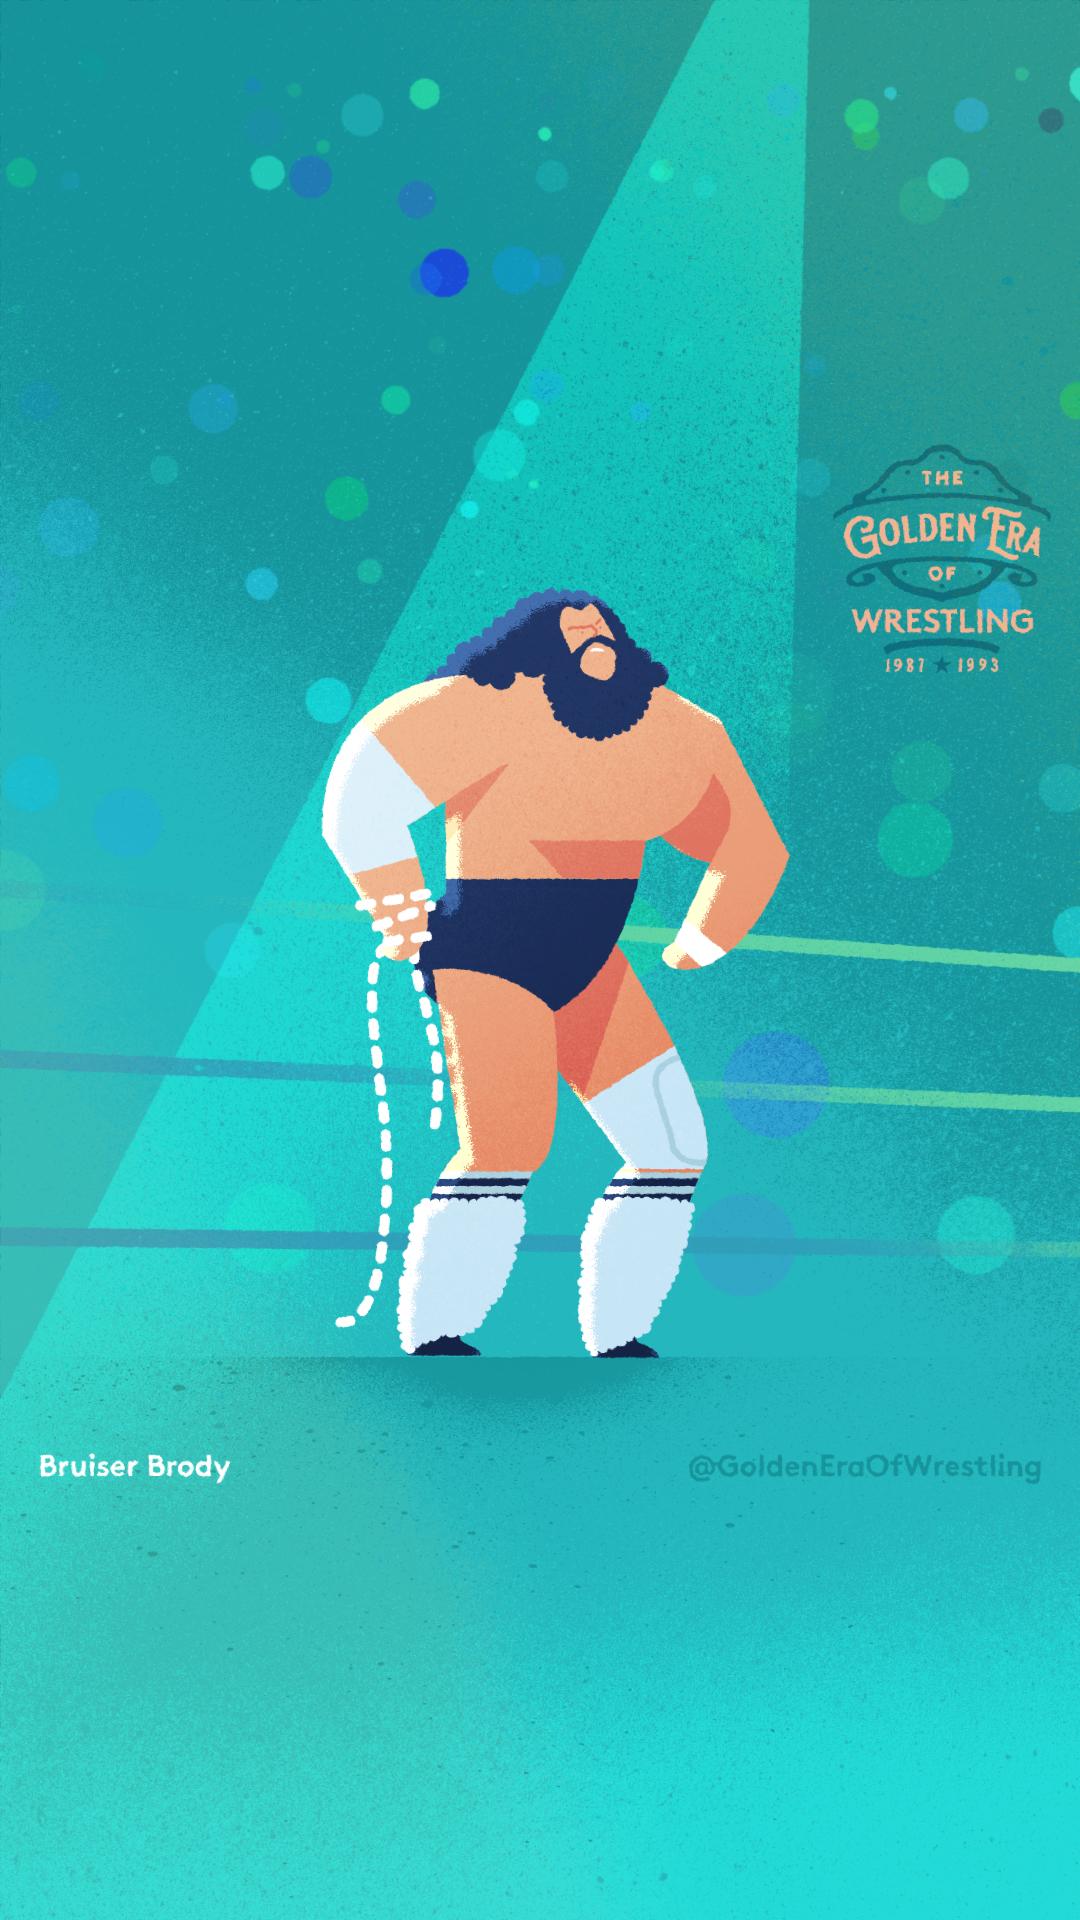 153 - Bruiser Brody.jpg